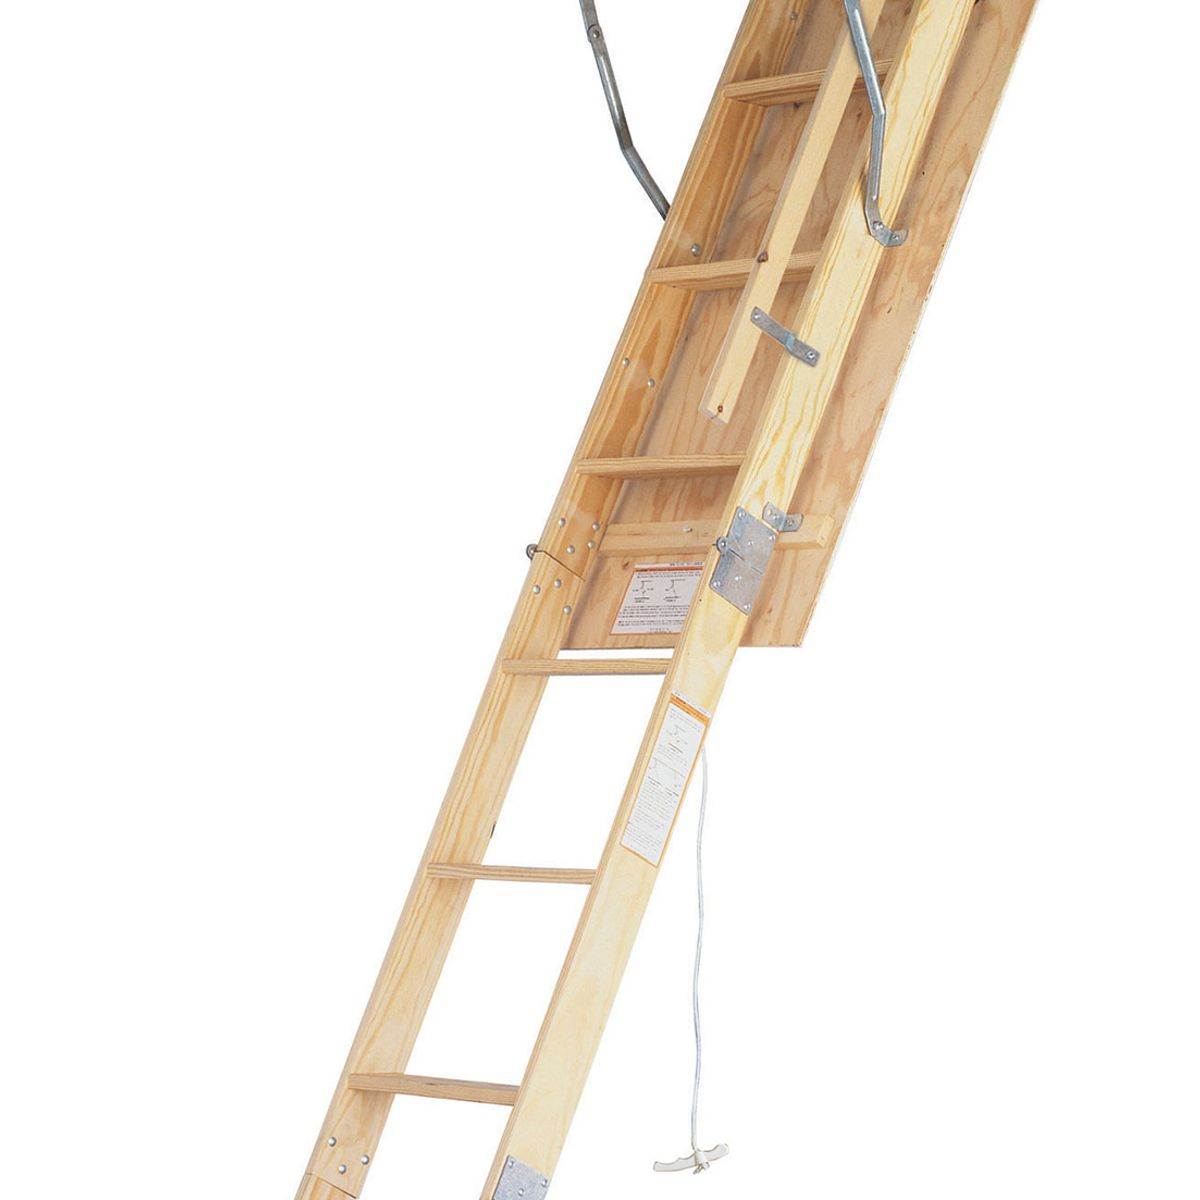 W2208K Attic Ladders - Keller US  sc 1 st  Keller Ladder & W2208K | Attic Ladders | Keller US